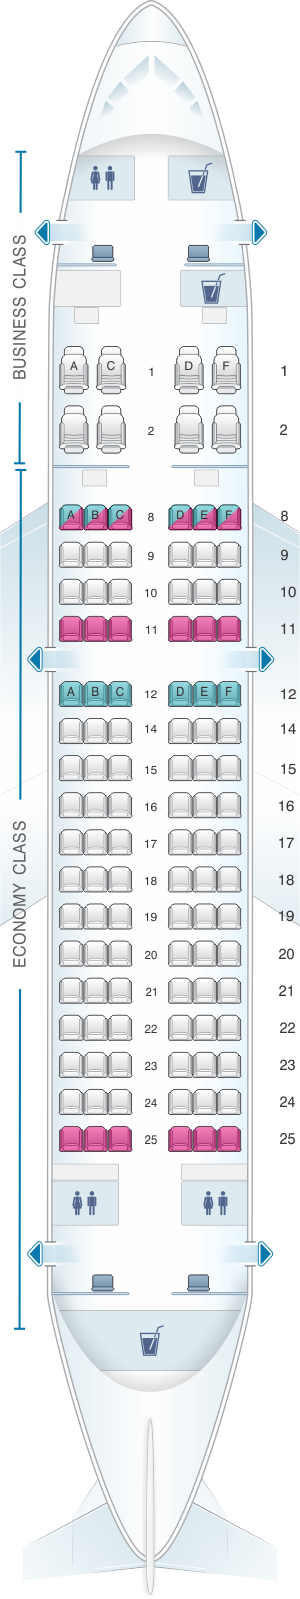 Seat map for Qatar Airways Airbus A319LR 110pax